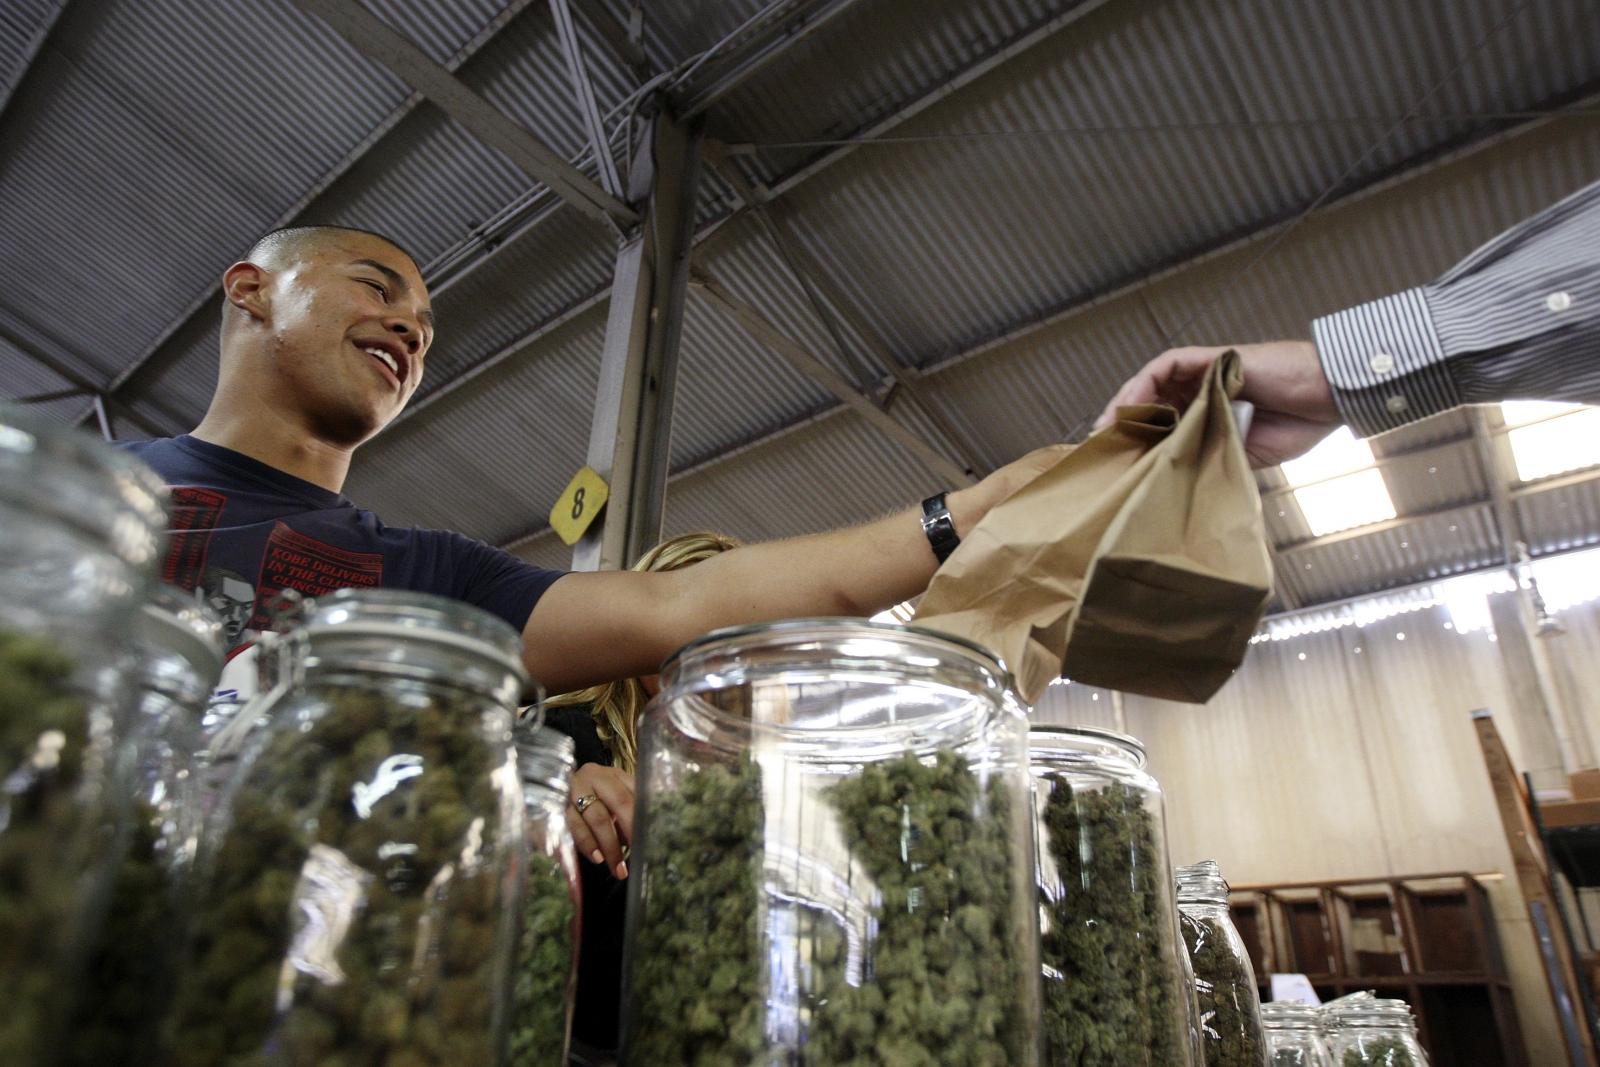 Free marijuana for those earning less than $32,000 (£19,00) in California town of Berkeley